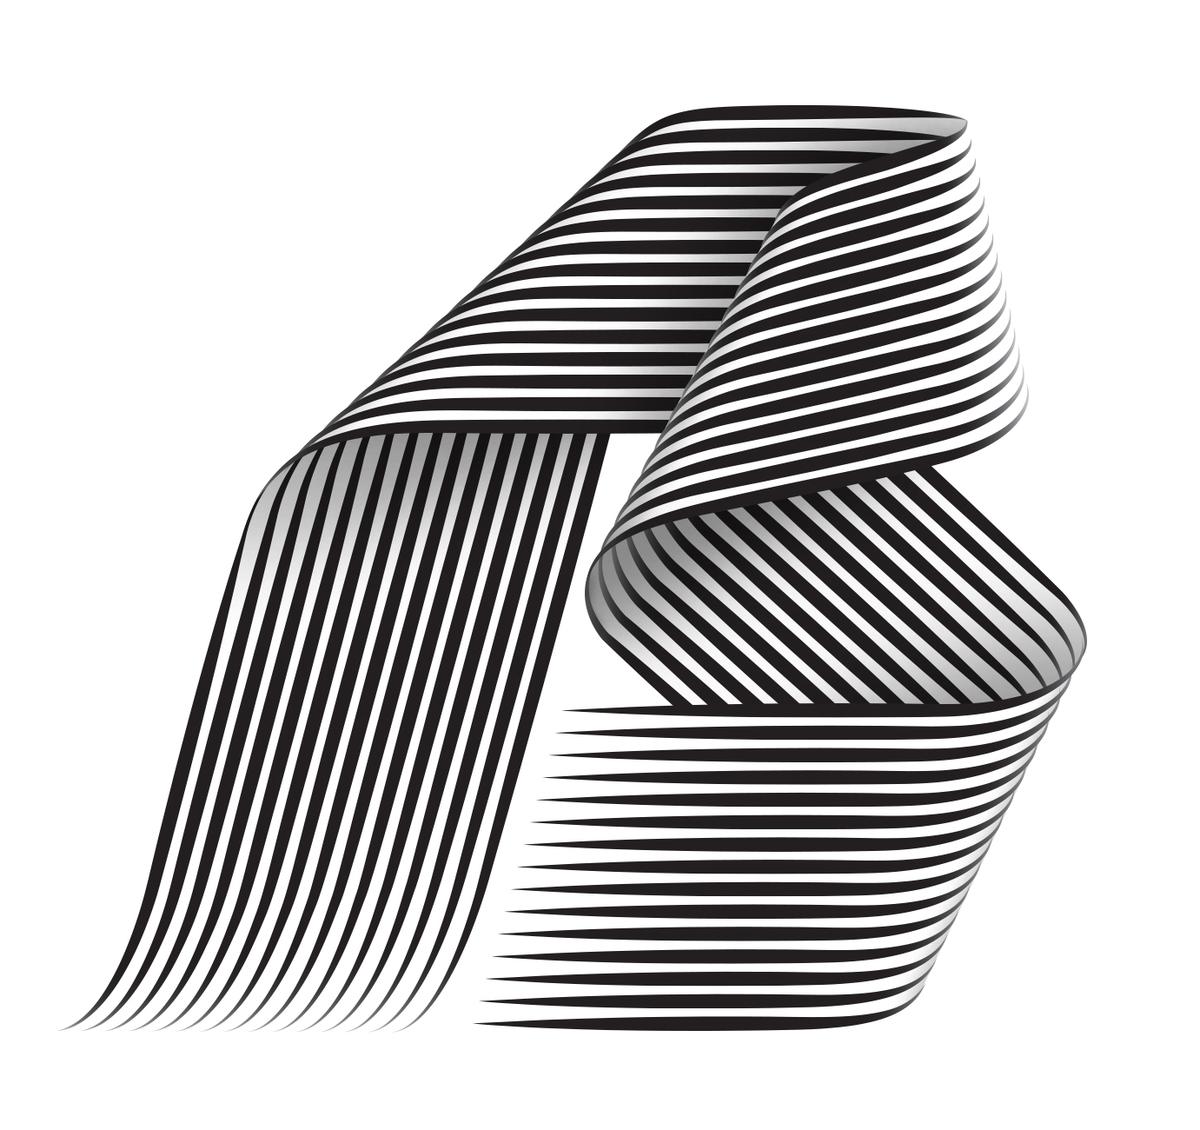 Ribbon Type - Experimental Lettering